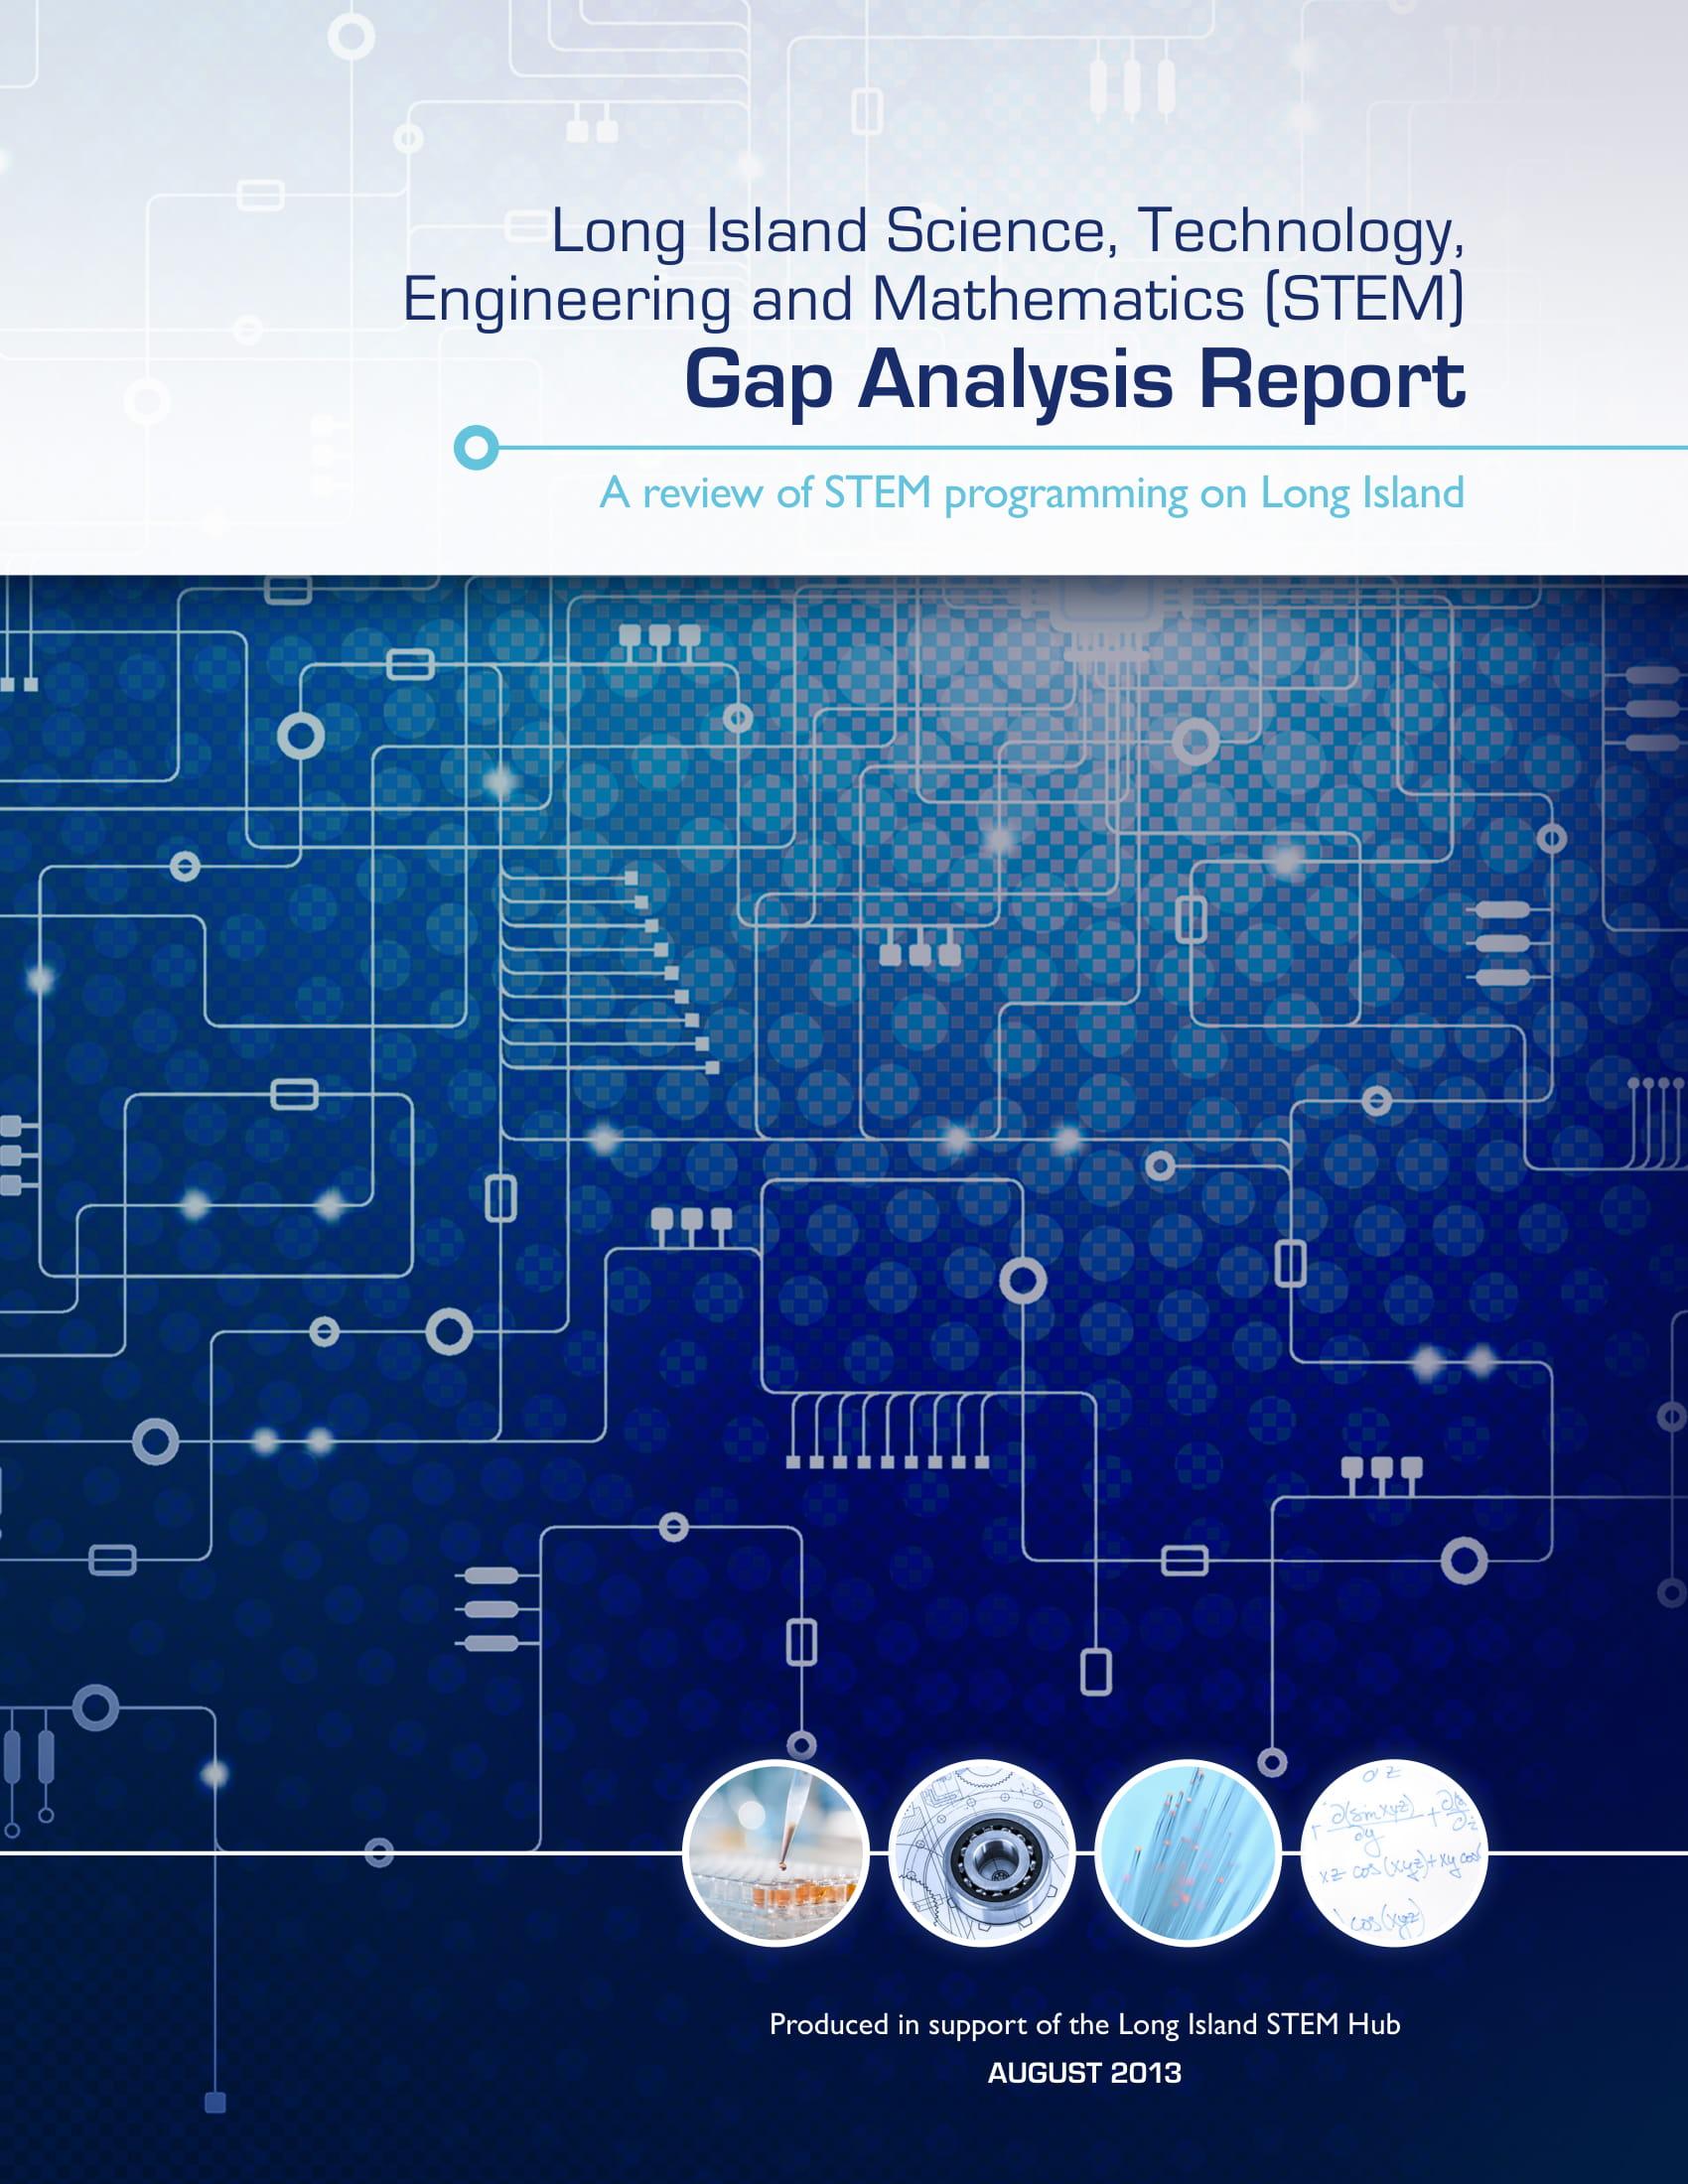 basic gap analysis report example 01